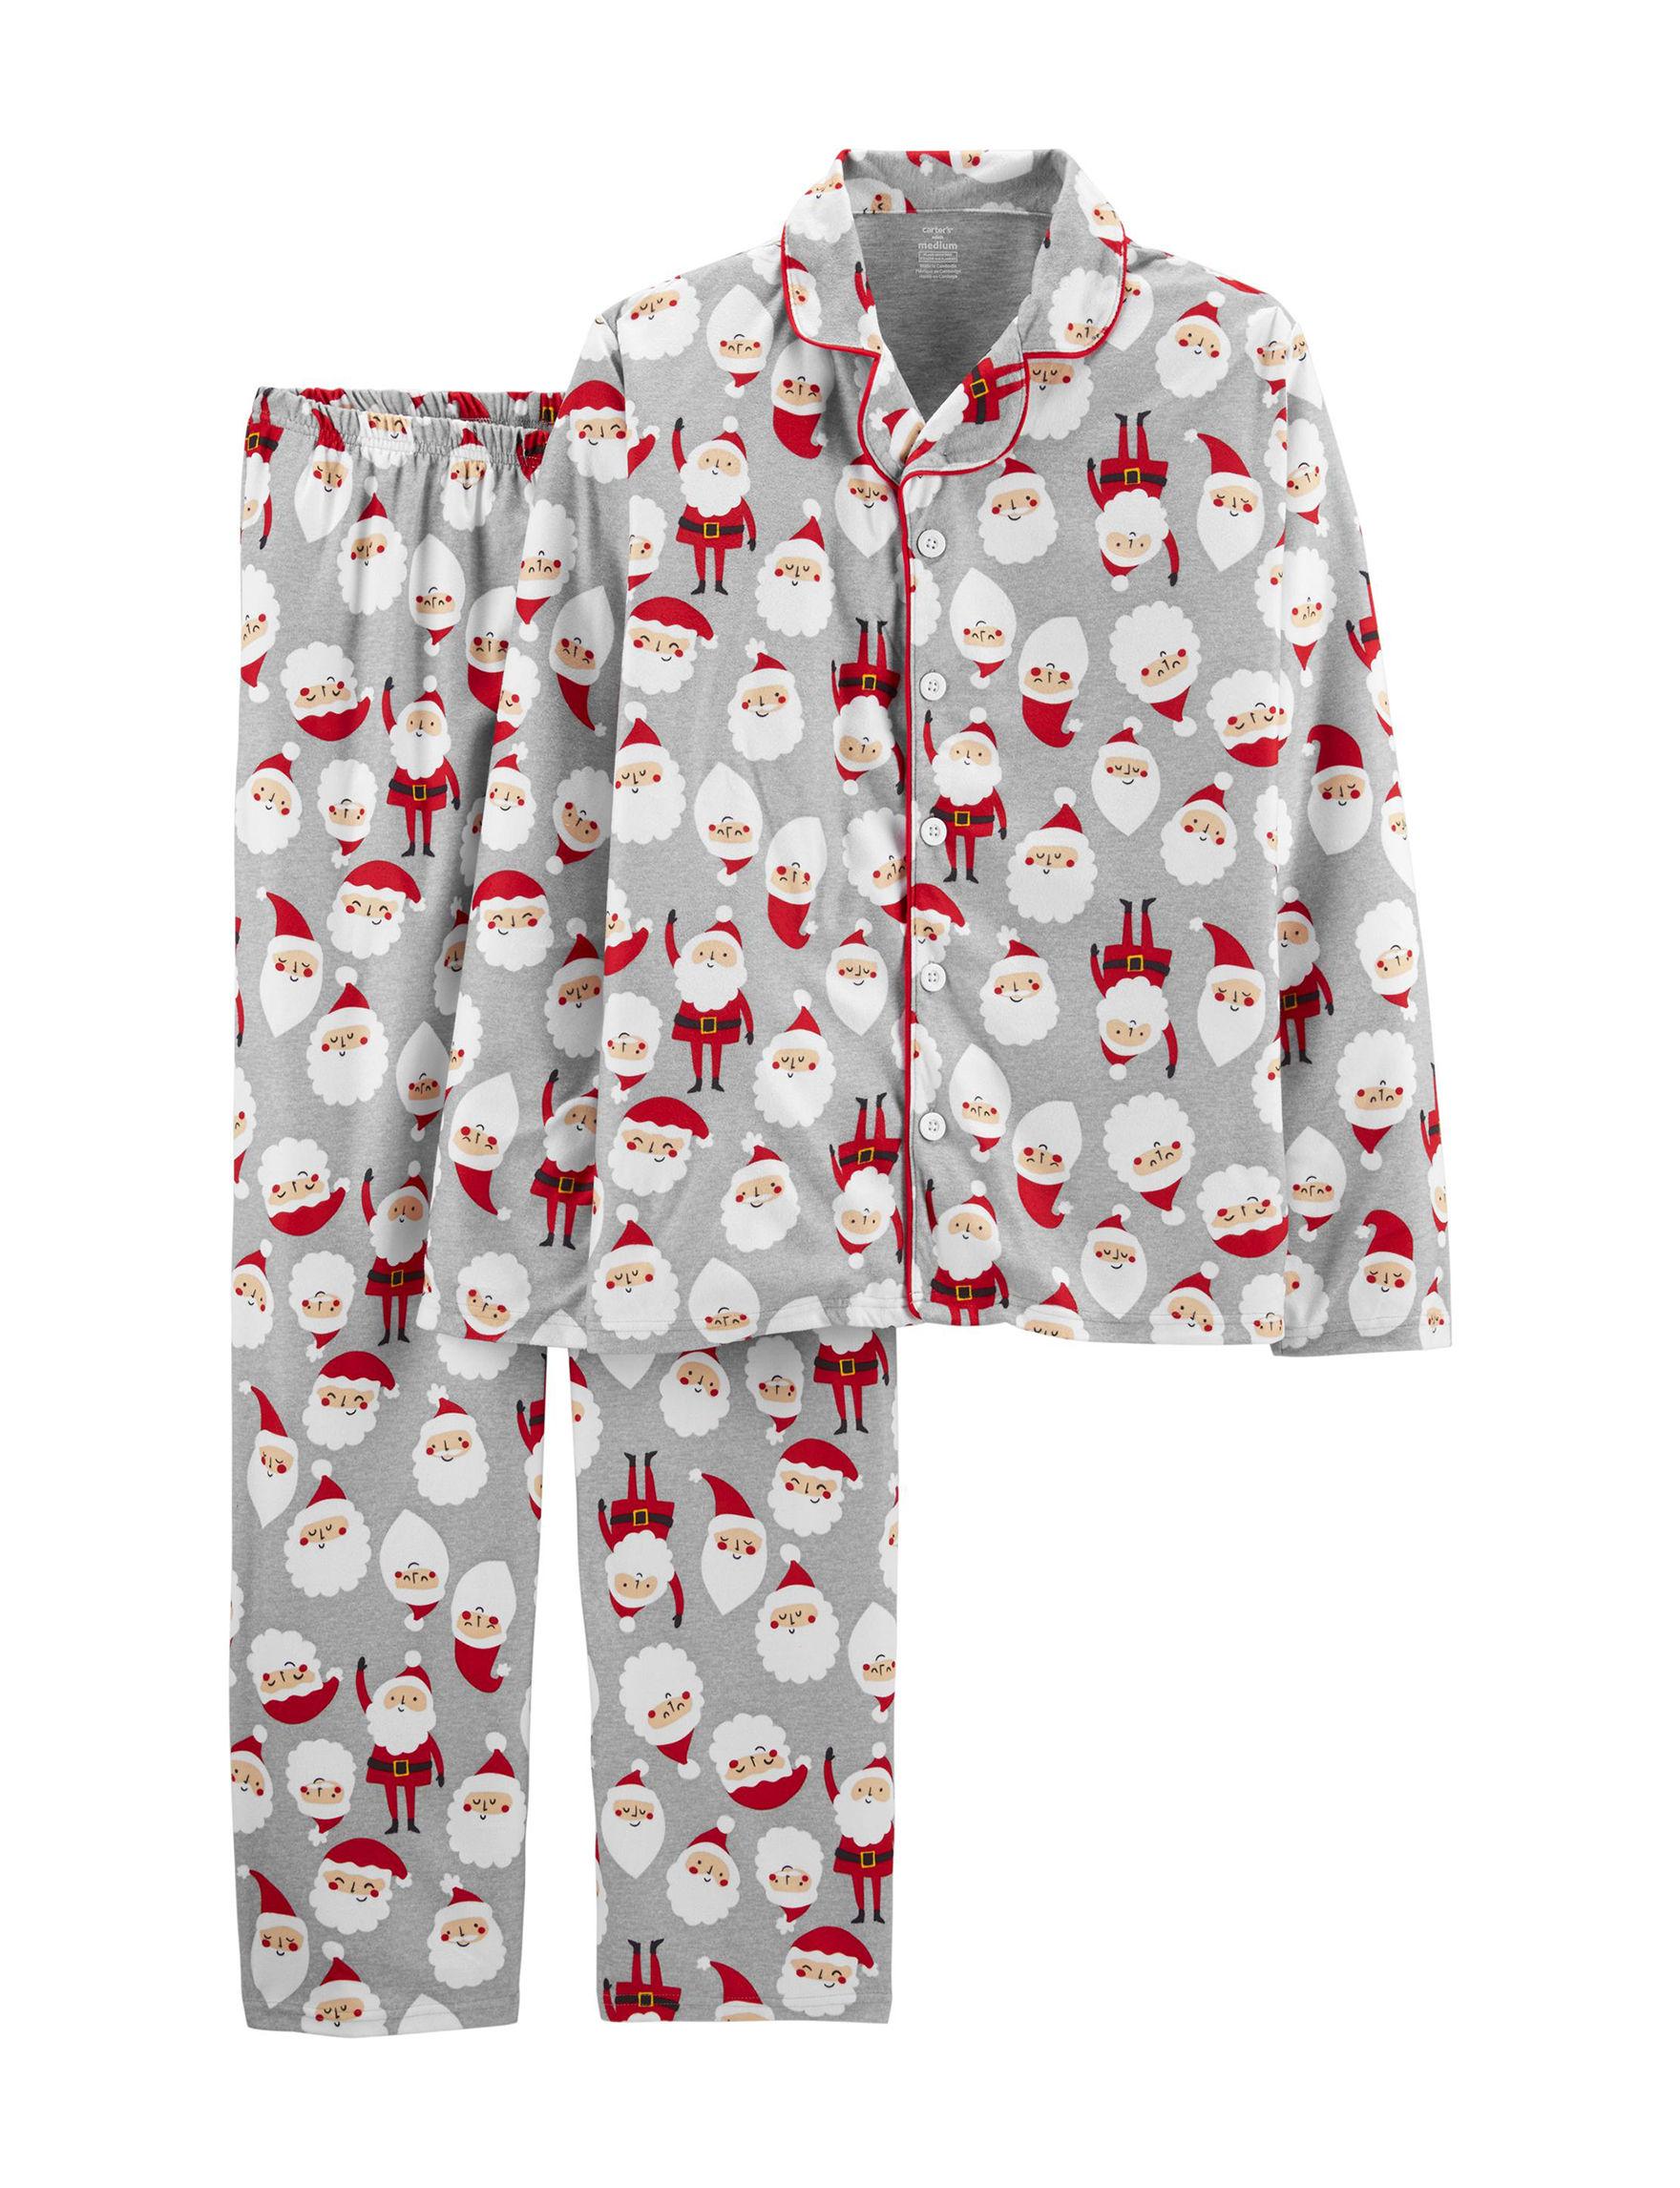 Carter's Grey / Red Pajama Sets